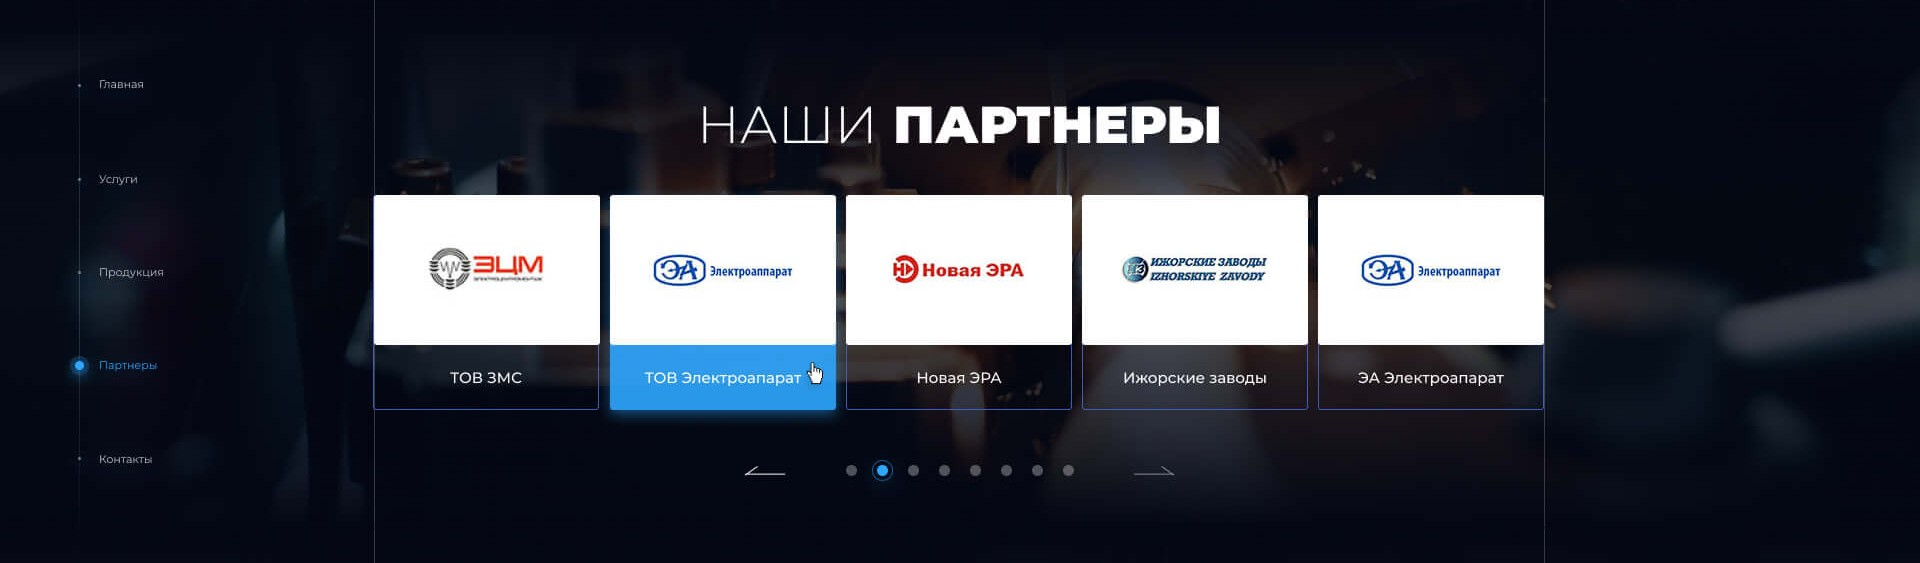 01_TokarnyyeTekhnologii_Home page(4)